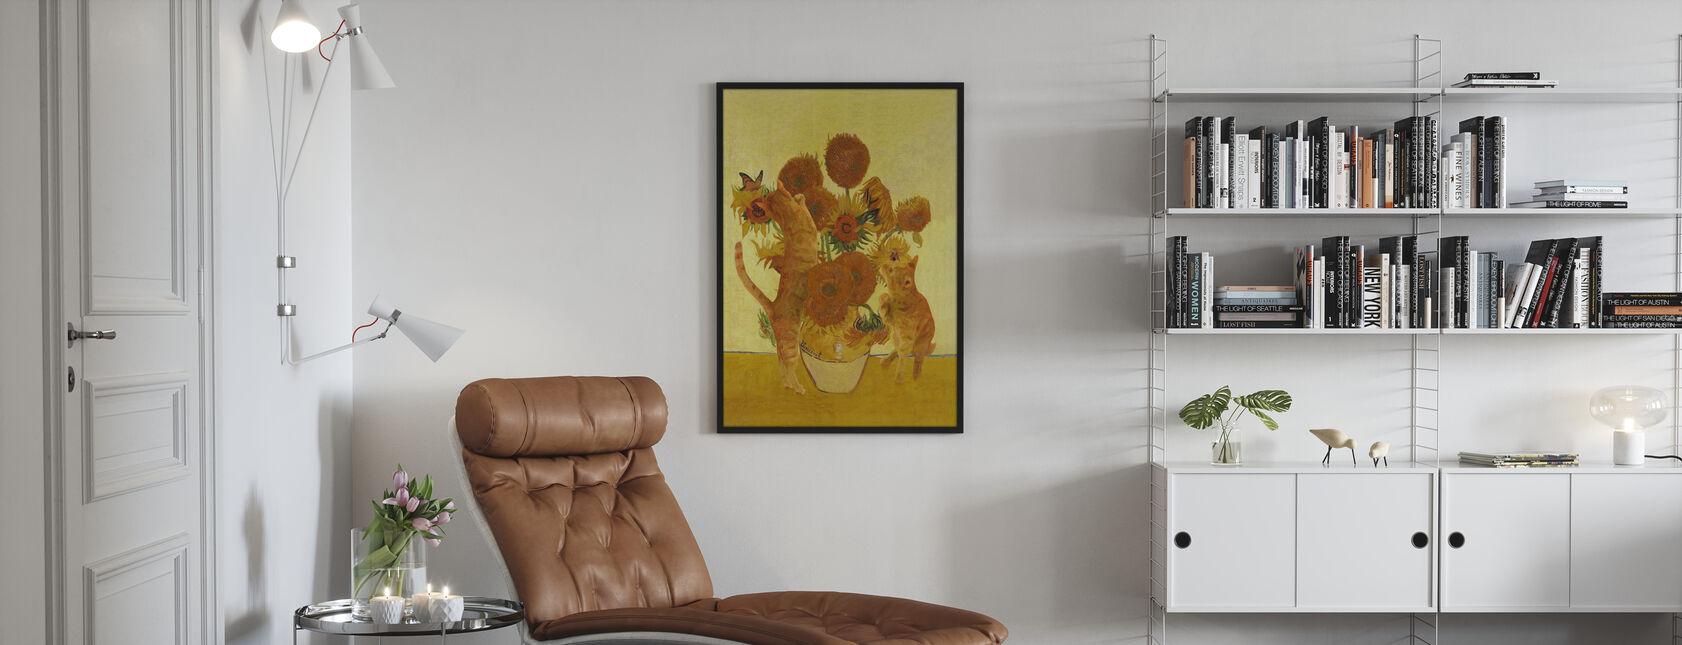 Vangogh Katte - Plakat - Stue